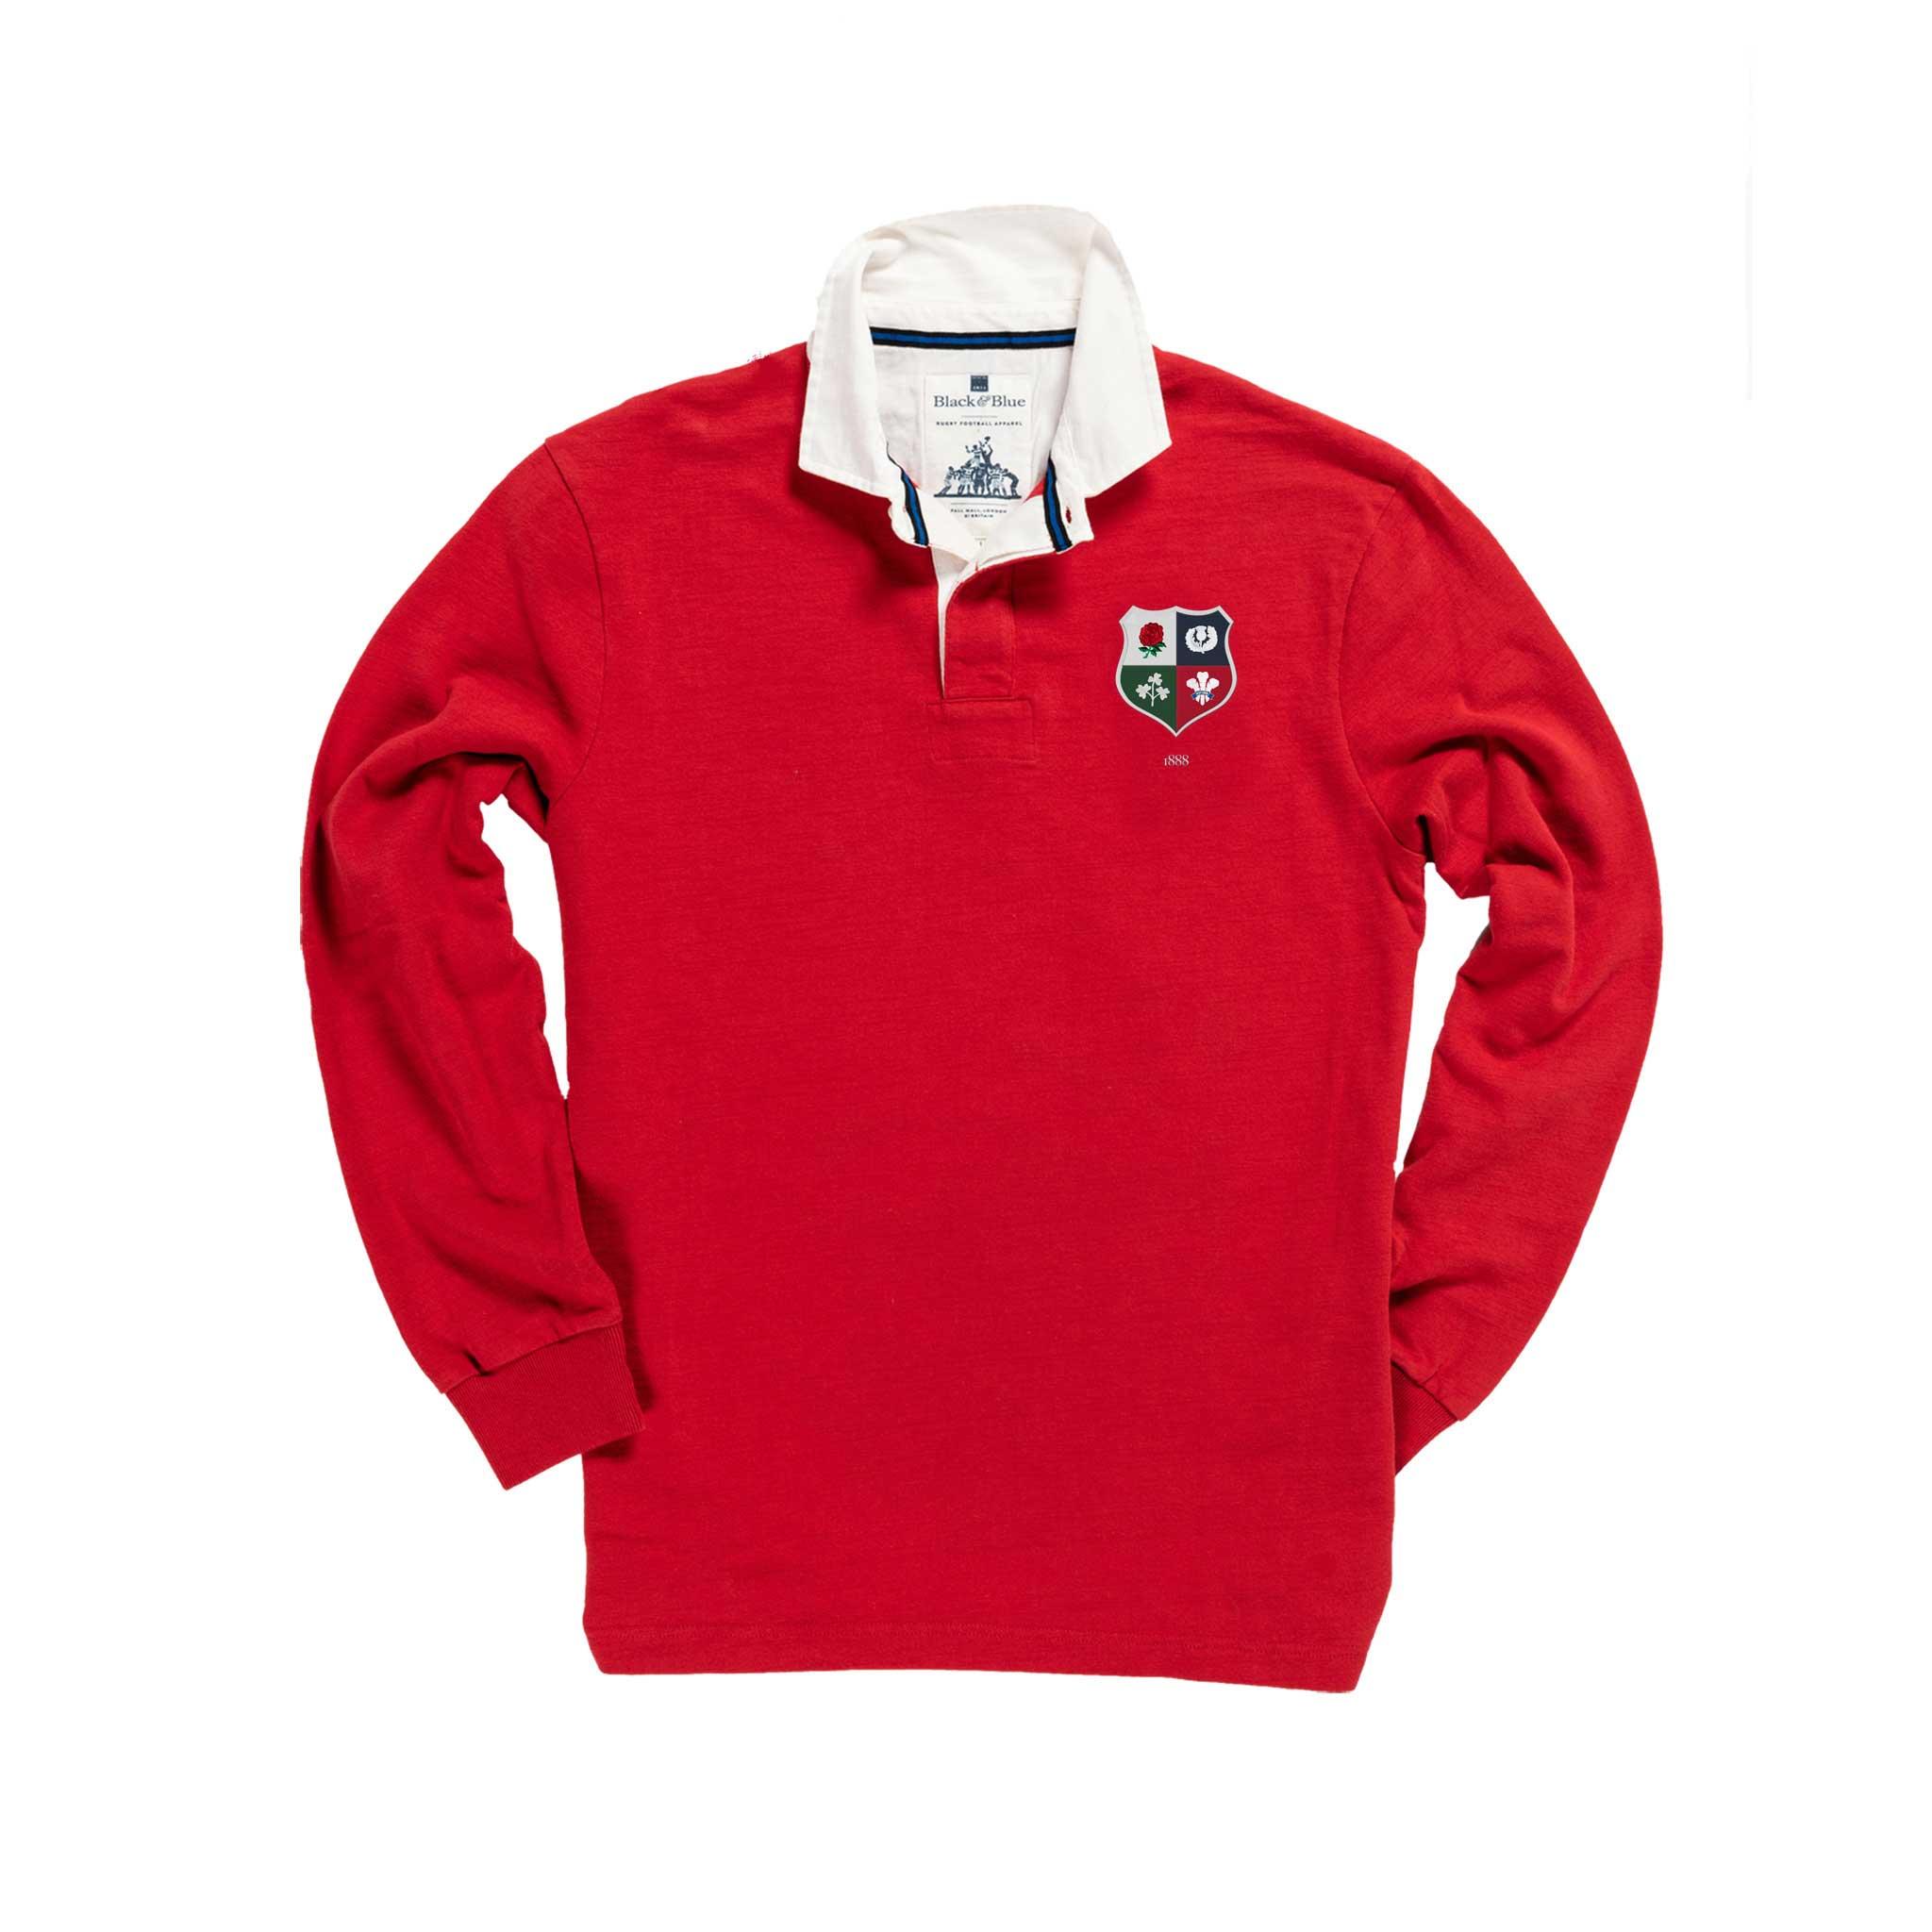 British and Irish Lions 1888 Rugby Shirt_Front